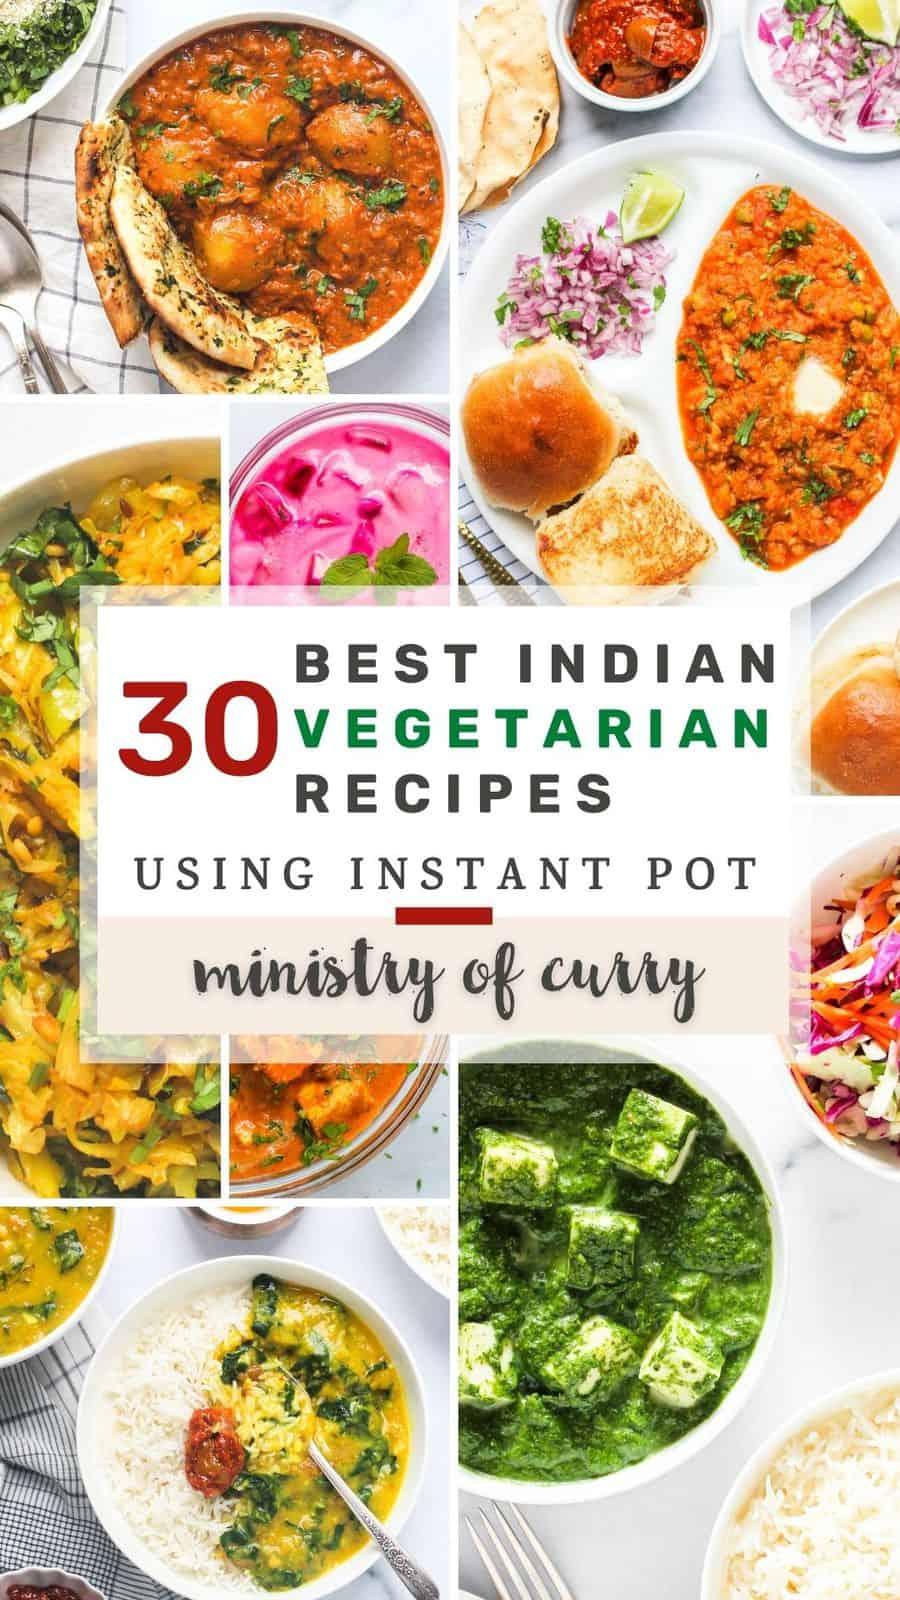 collage of Indian vegetarian recipe photos